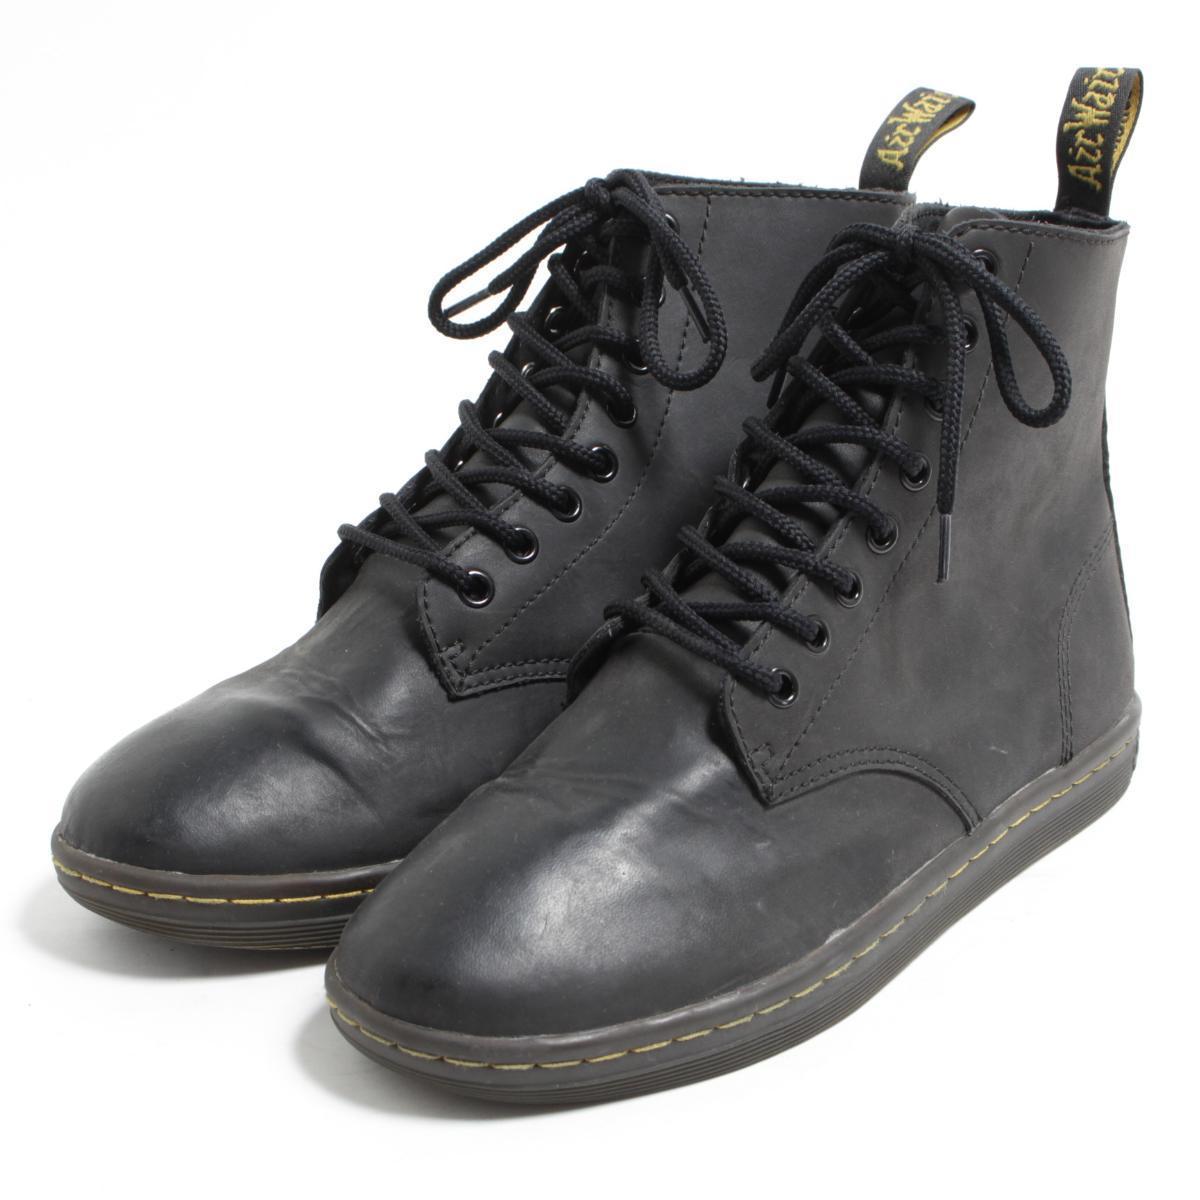 1301bad7a110 VINTAGE CLOTHING JAM  Doctor Martin Dr.Martens TOBIAS 8 hall boots ...